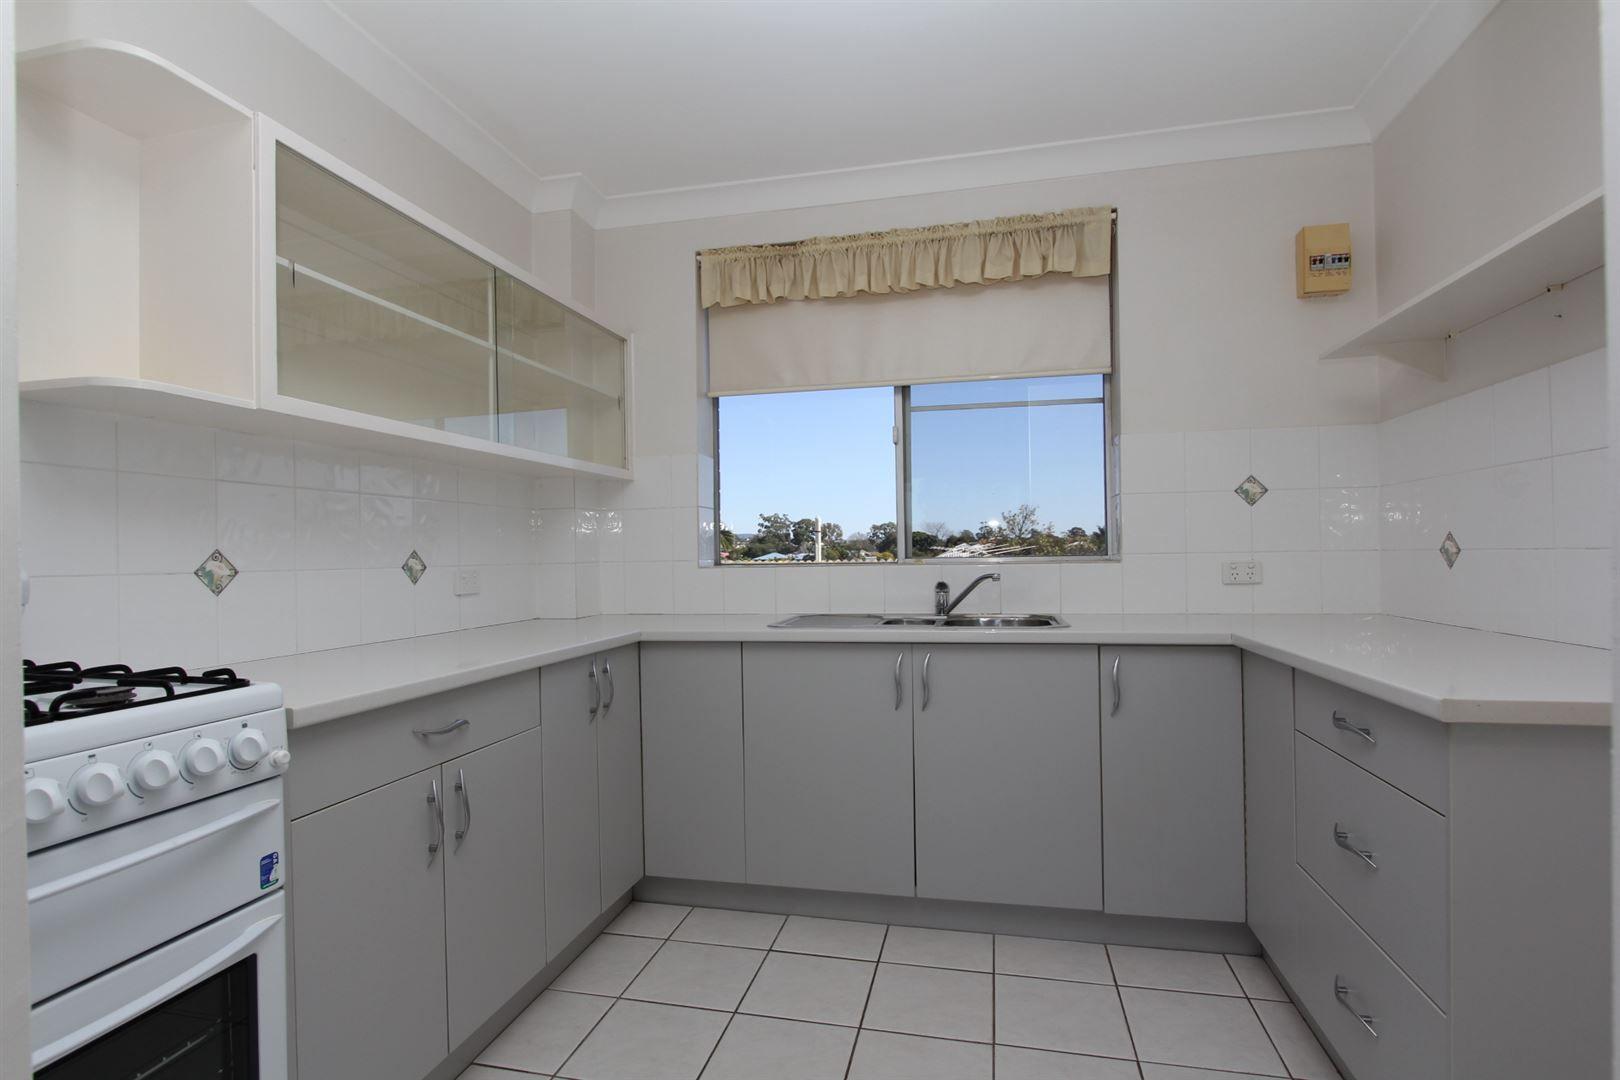 4/66 Gellibrand St, Clayfield QLD 4011, Image 1